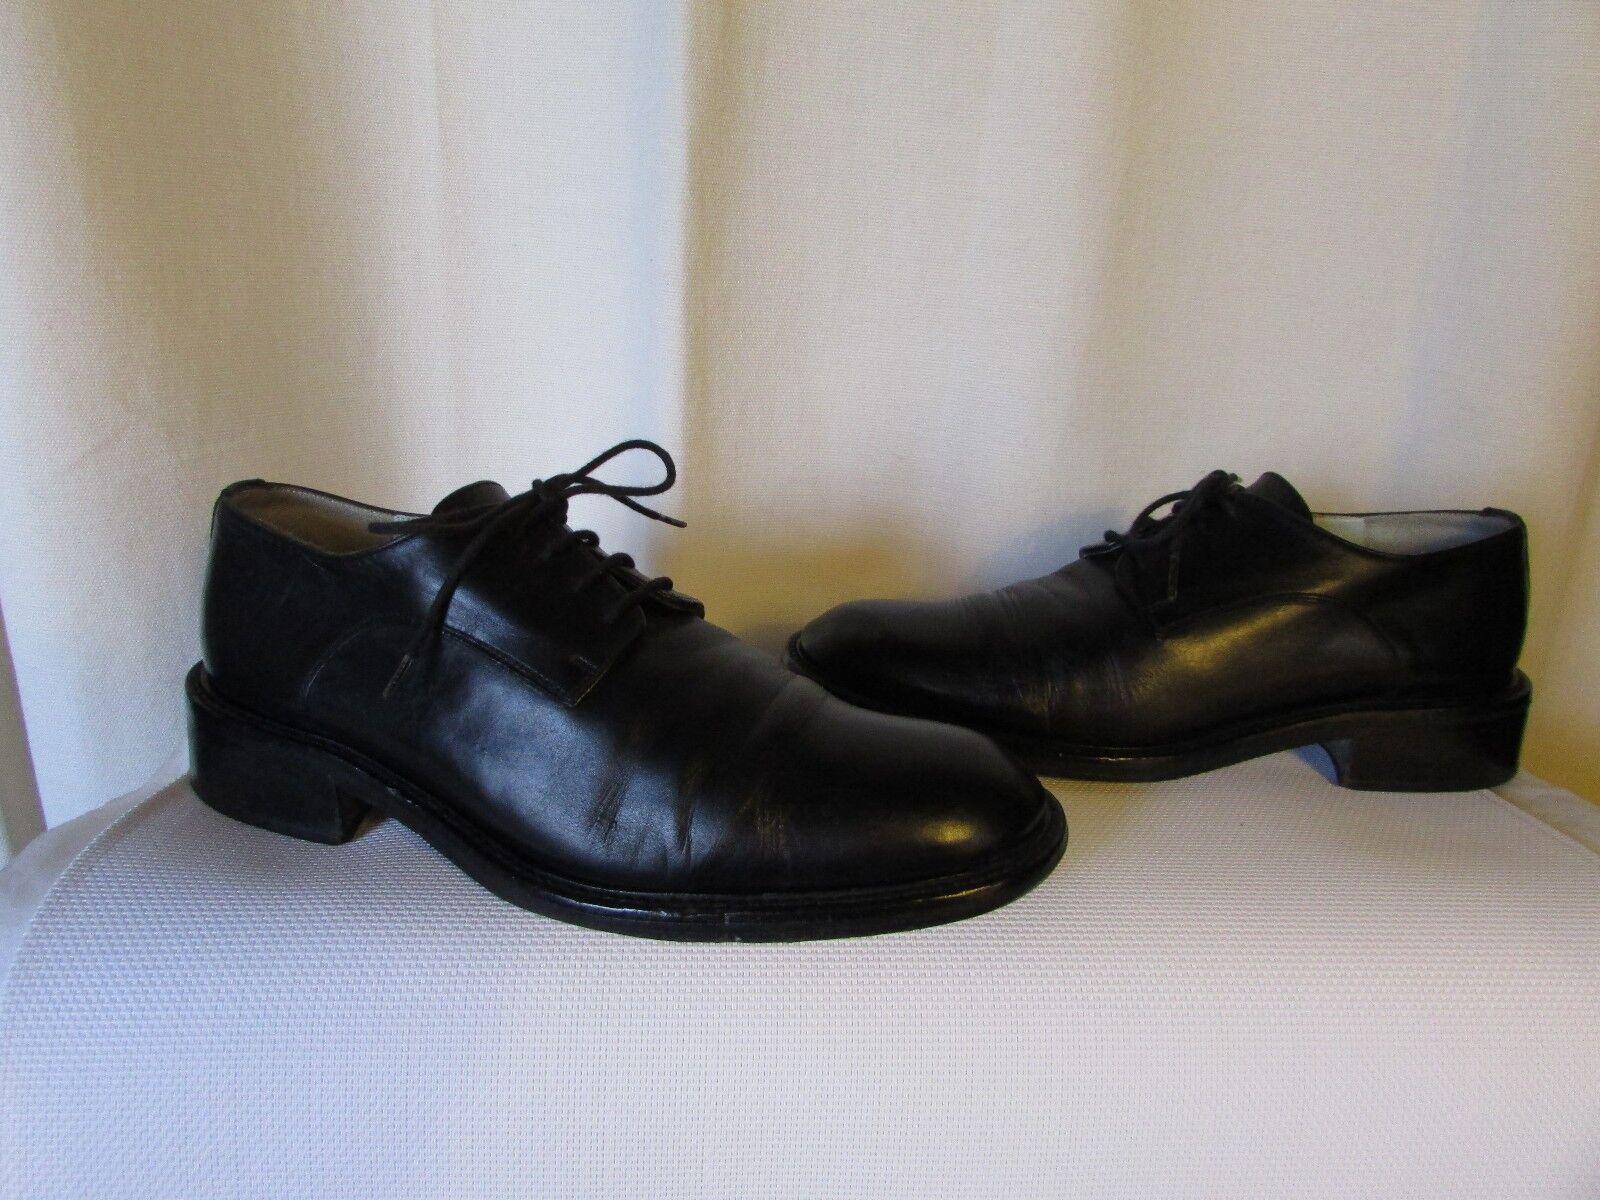 scarpe lance francesine free lance scarpe pelle nera taglia 39 ad37e7